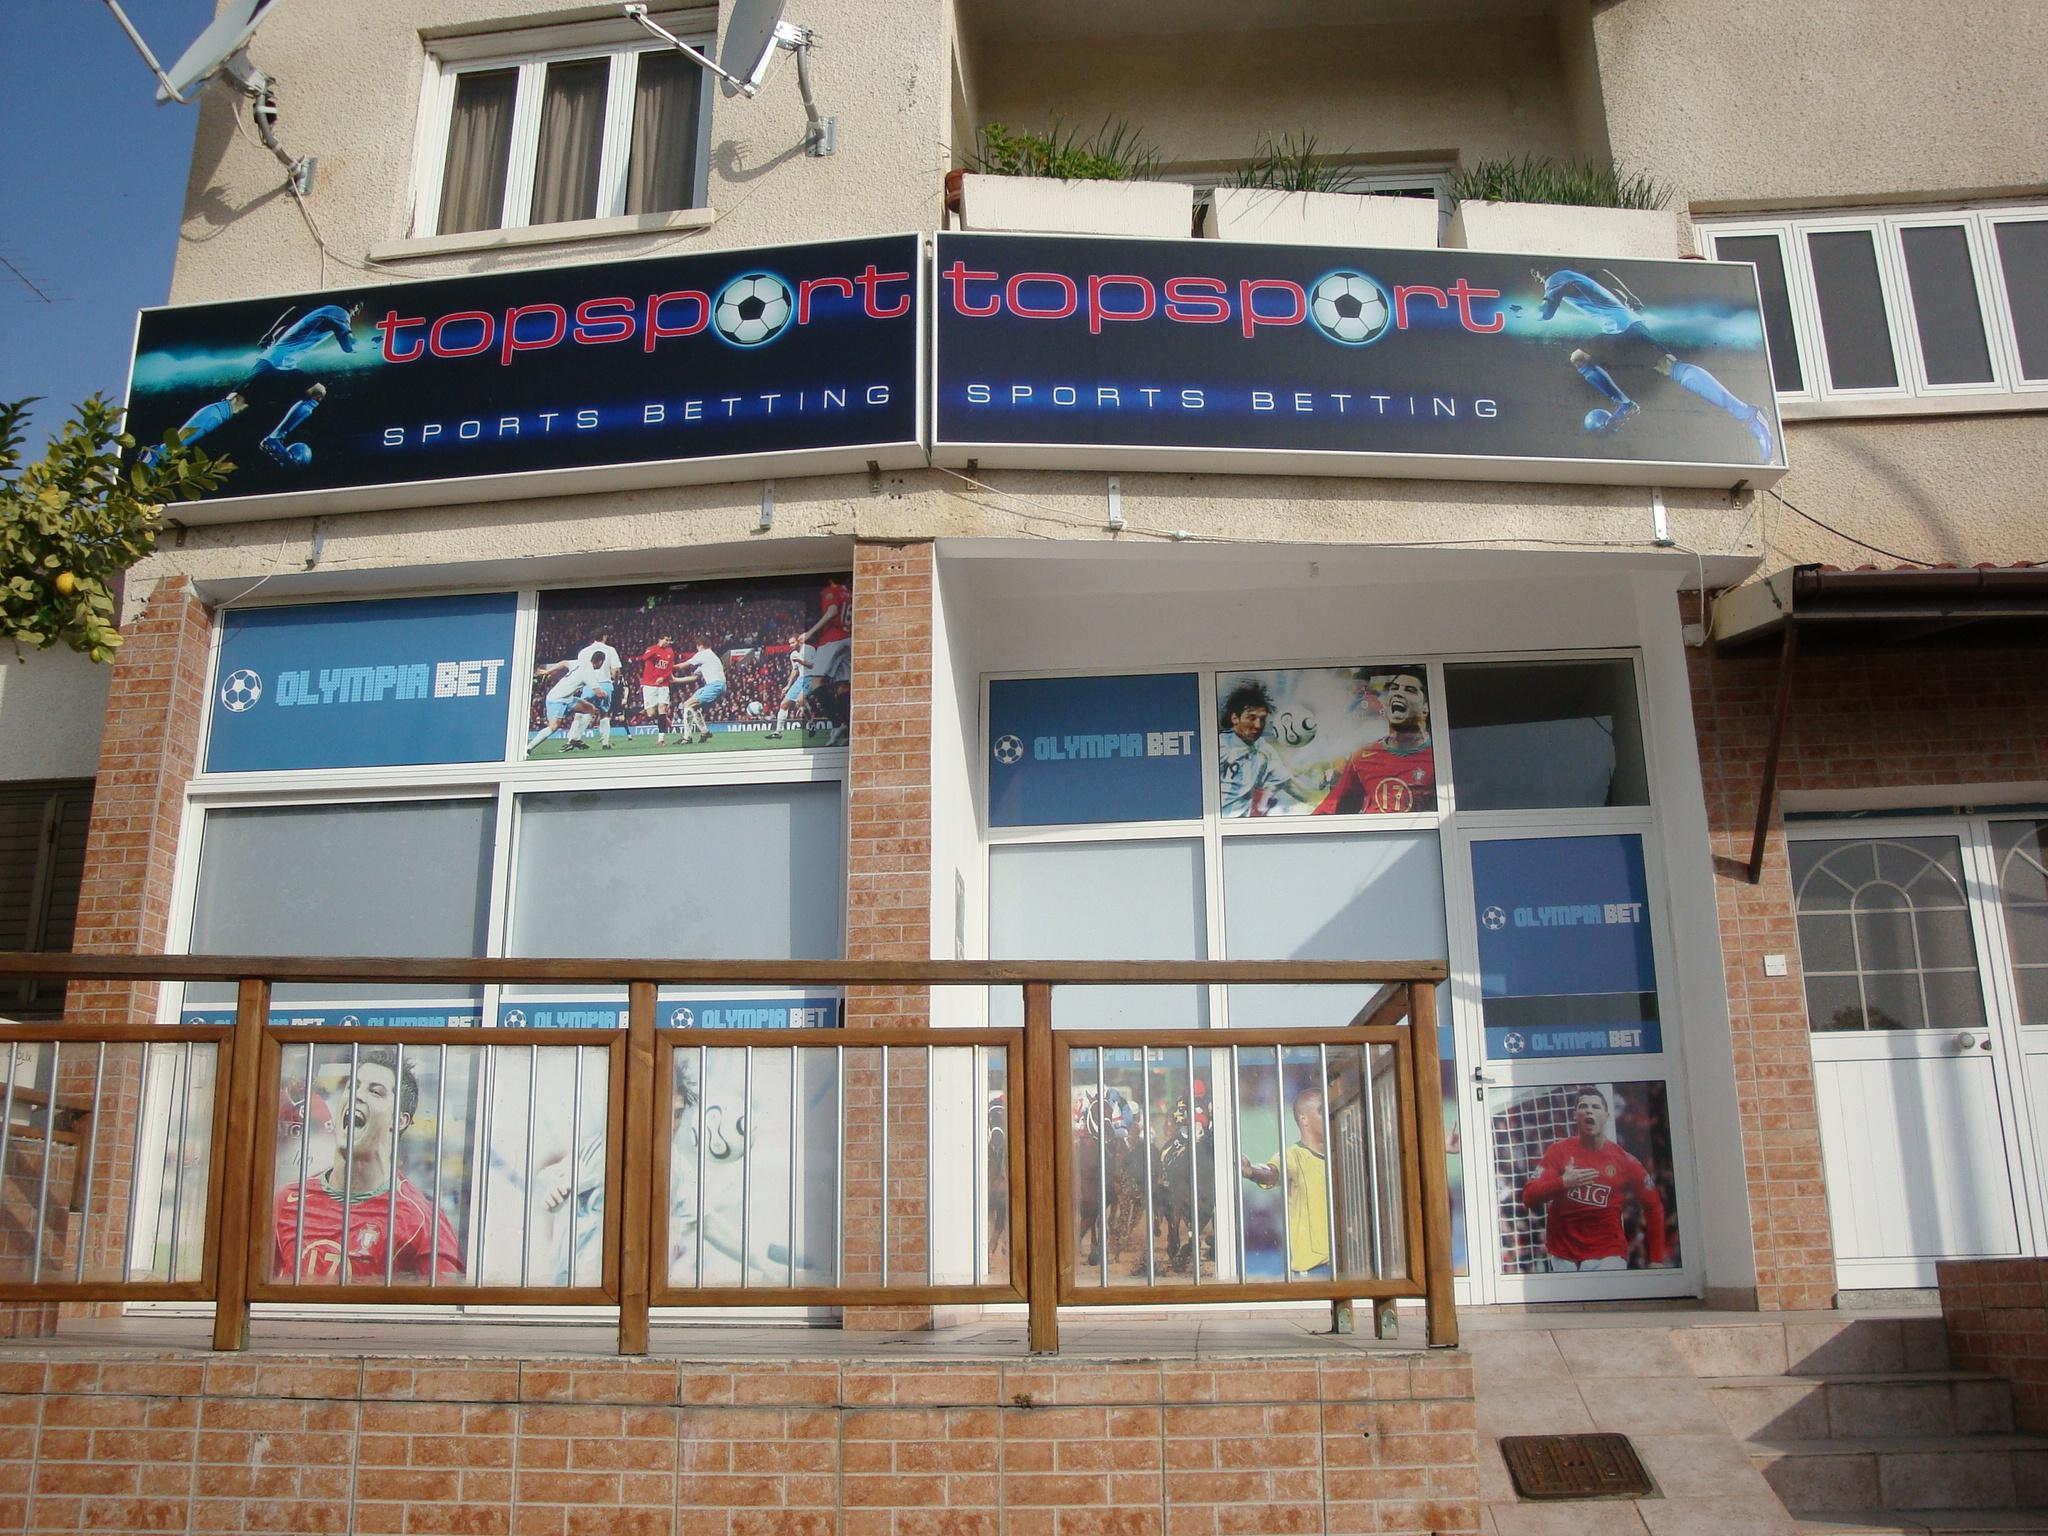 Top sport betting cyprus spread betting ireland tax free